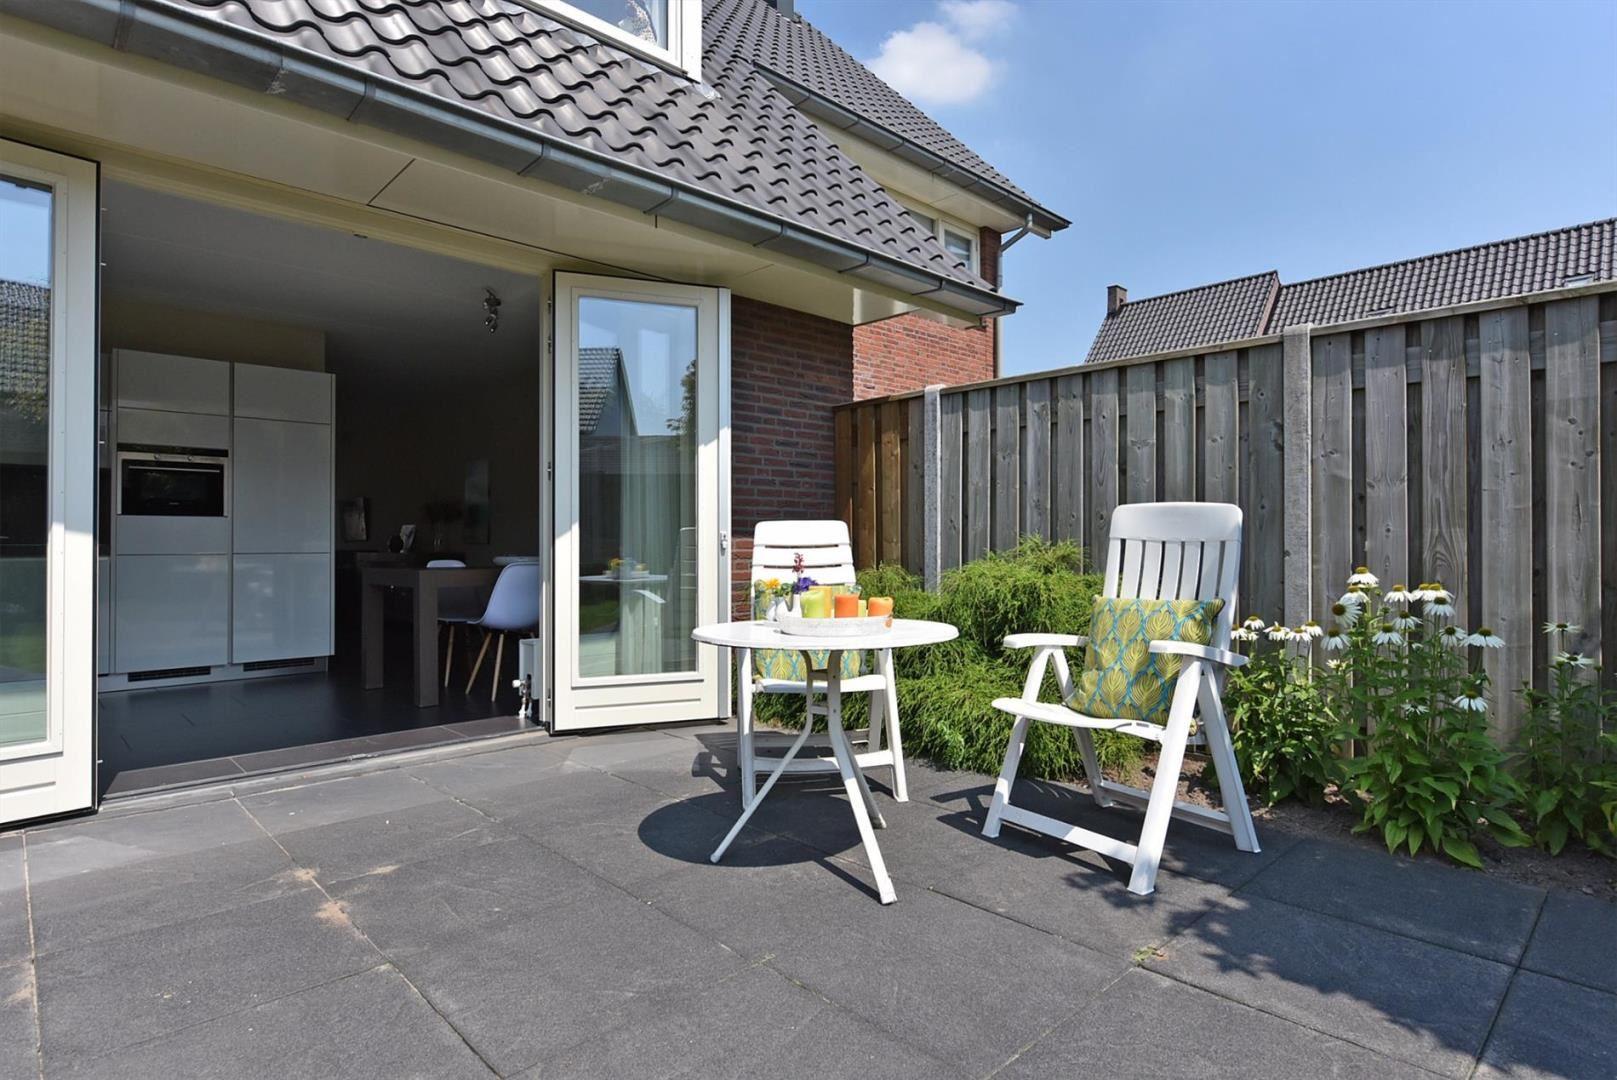 Huis te koop: het reut 403 5351 te berghem [funda]